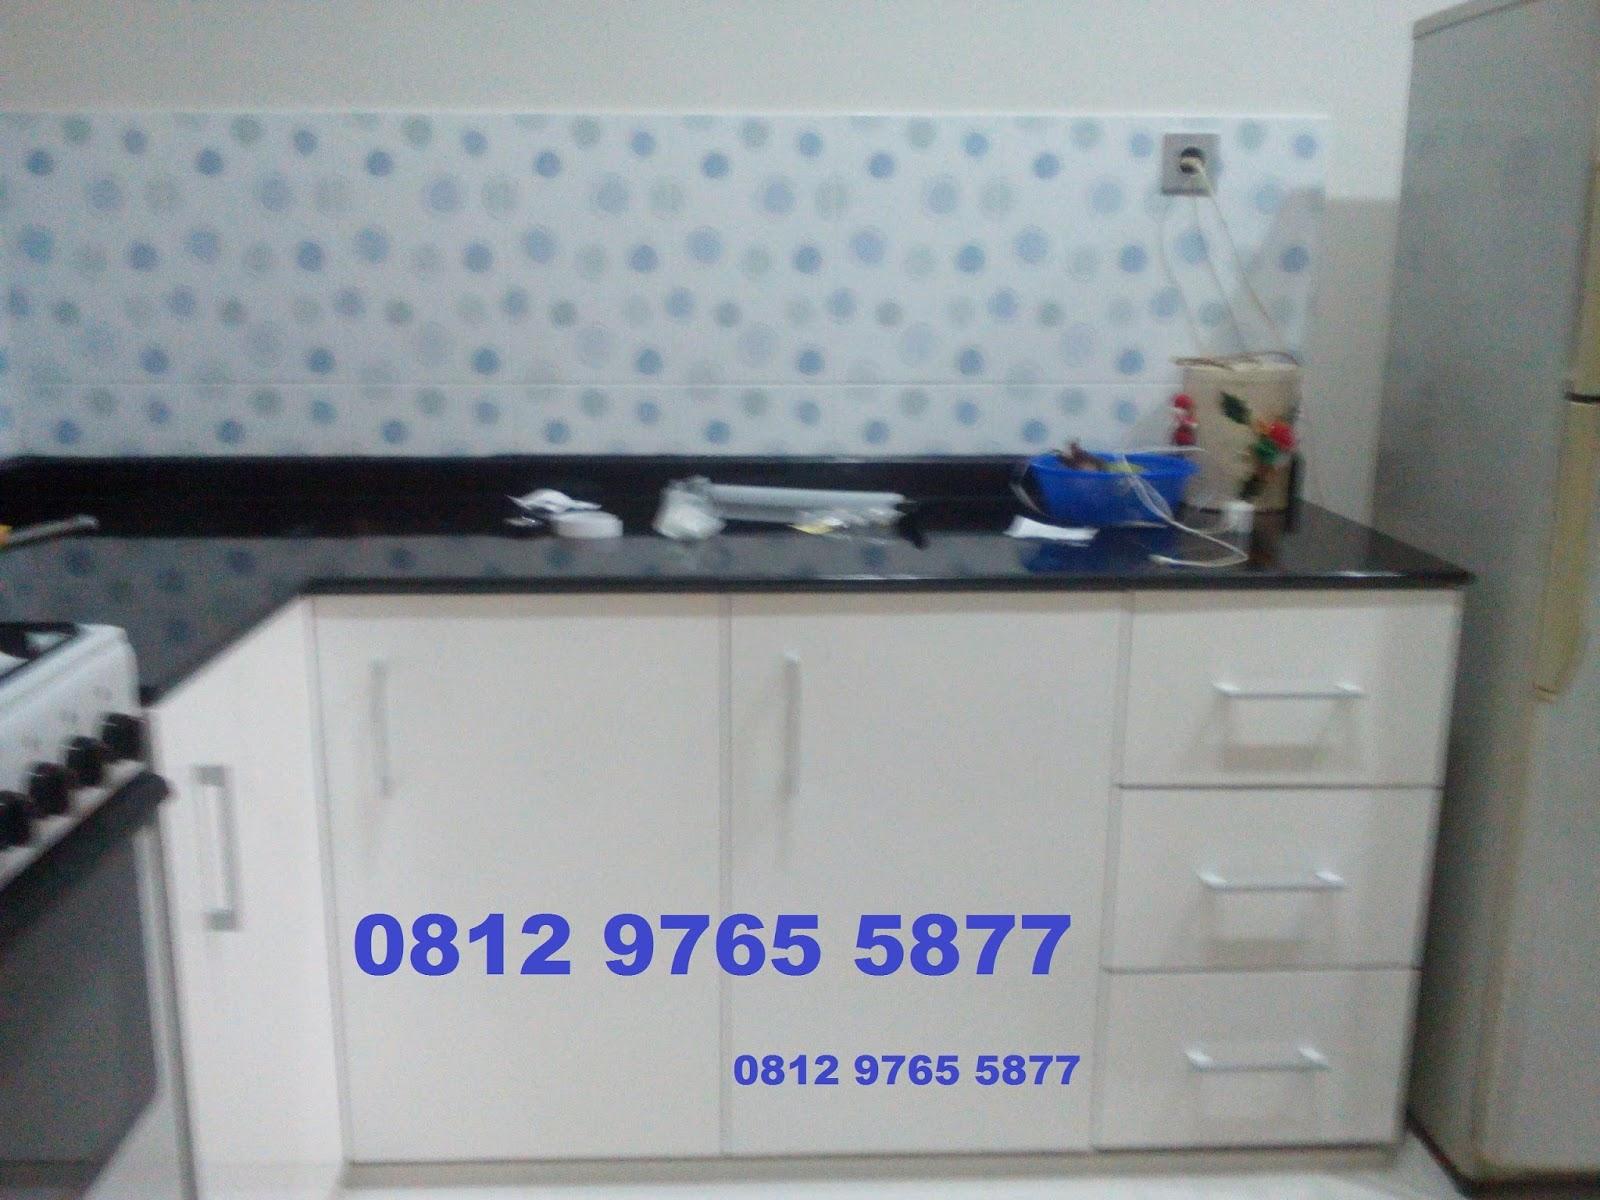 Jasa kitchen set murah di ciomas Bogor 081297655877